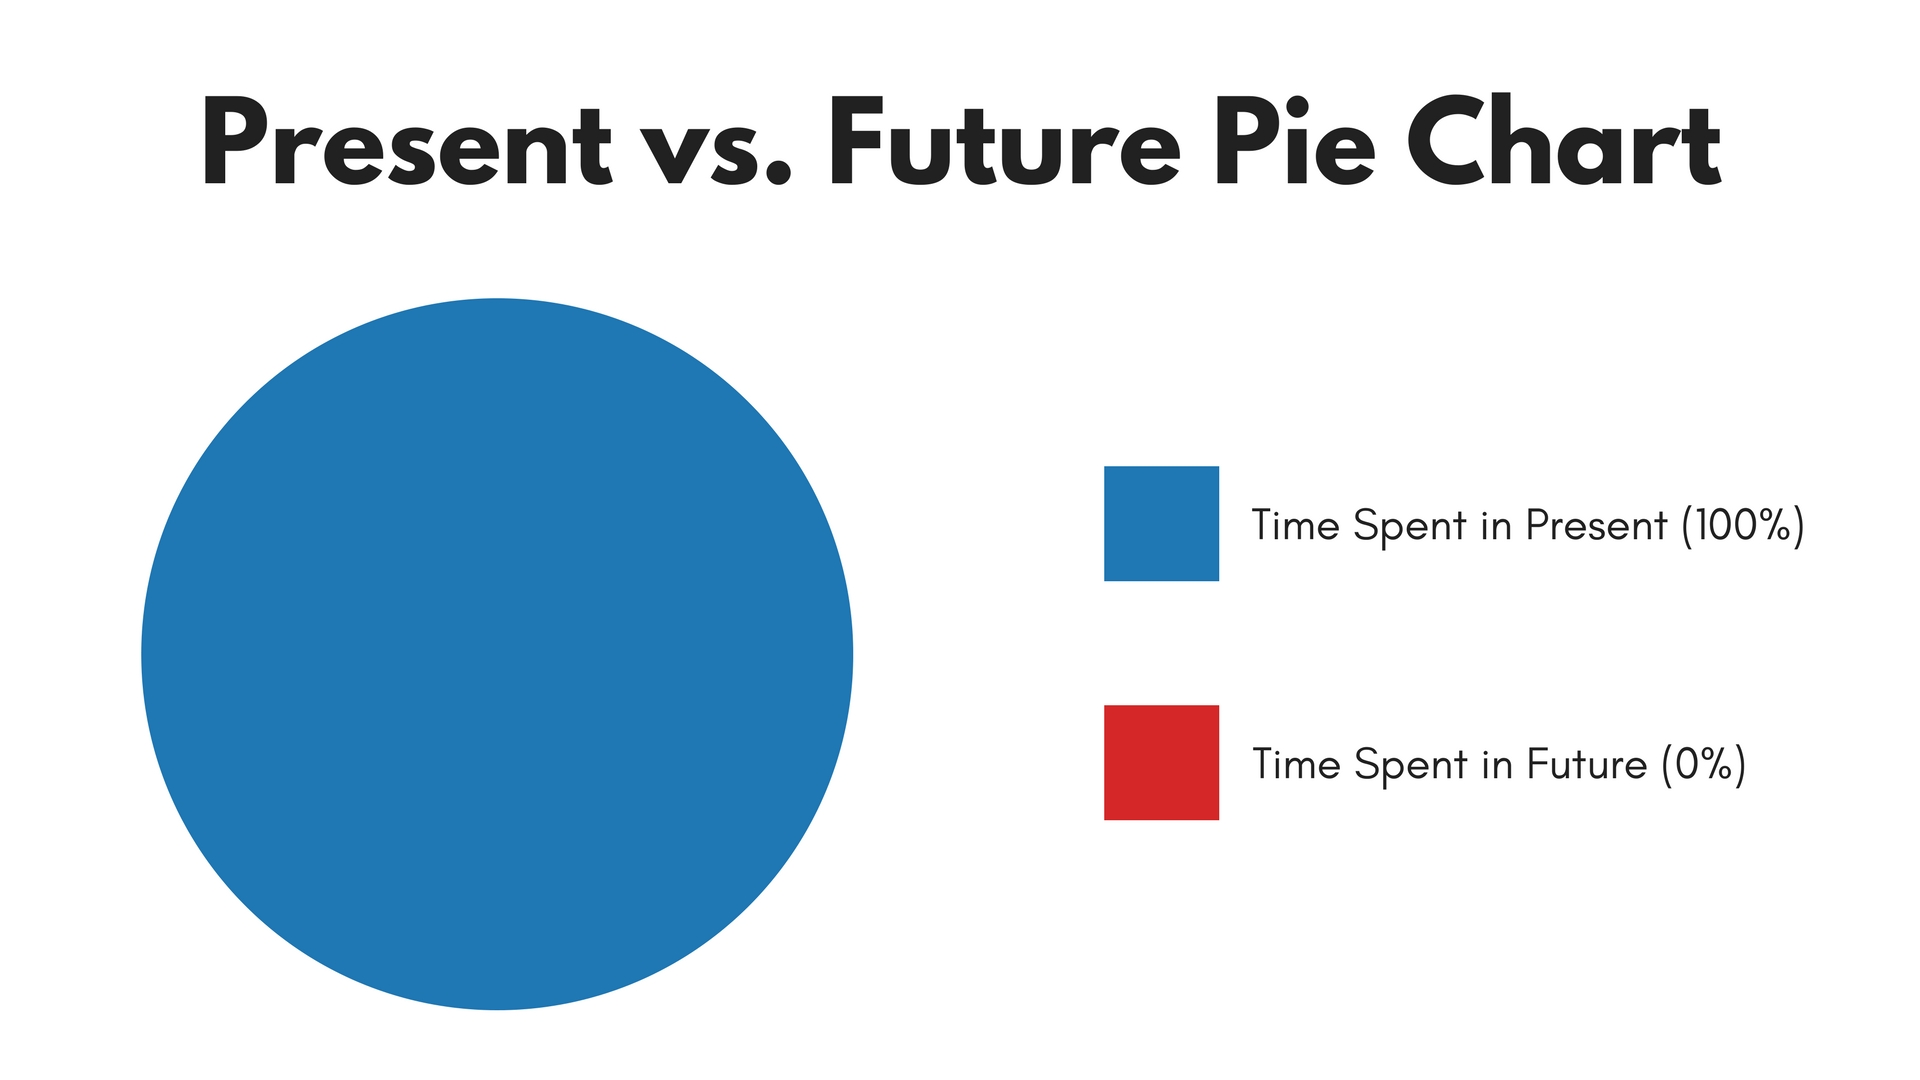 Present vs. Future Pie Chart